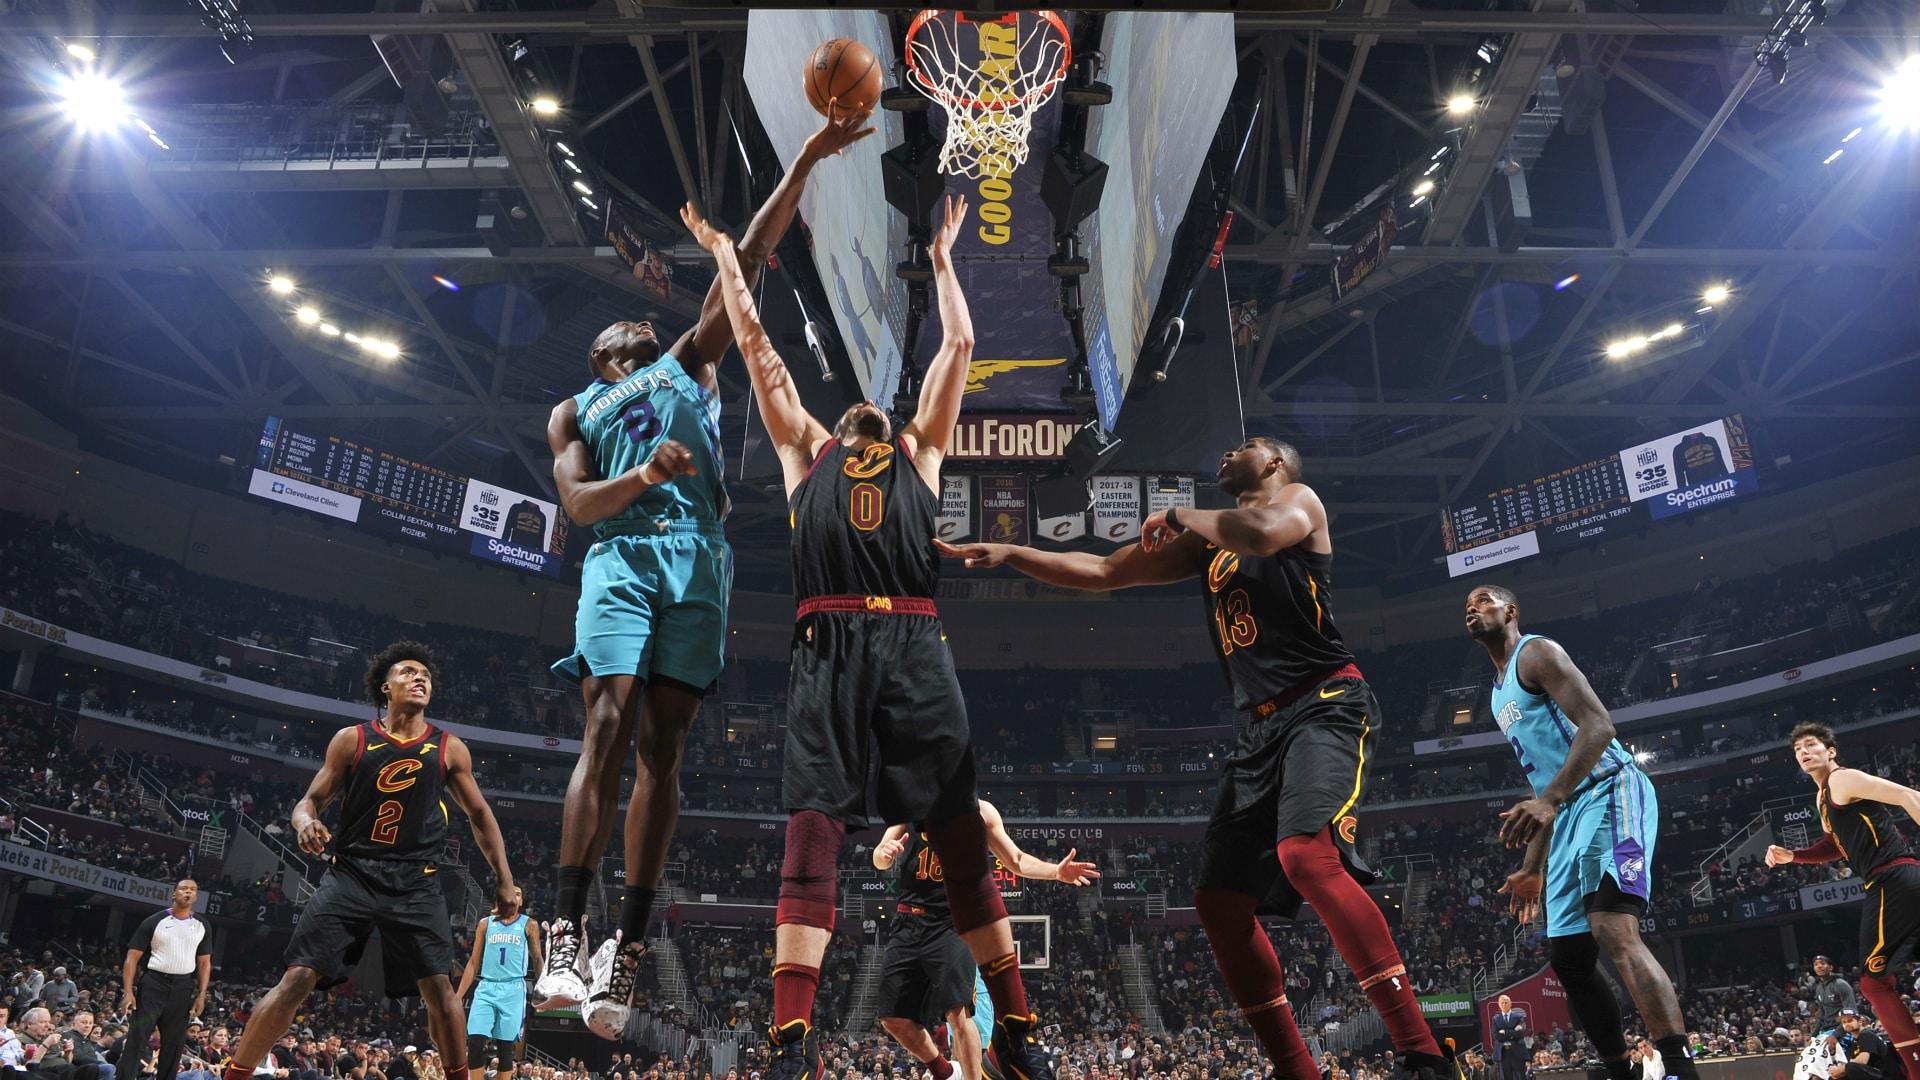 Hornets @ Cavaliers